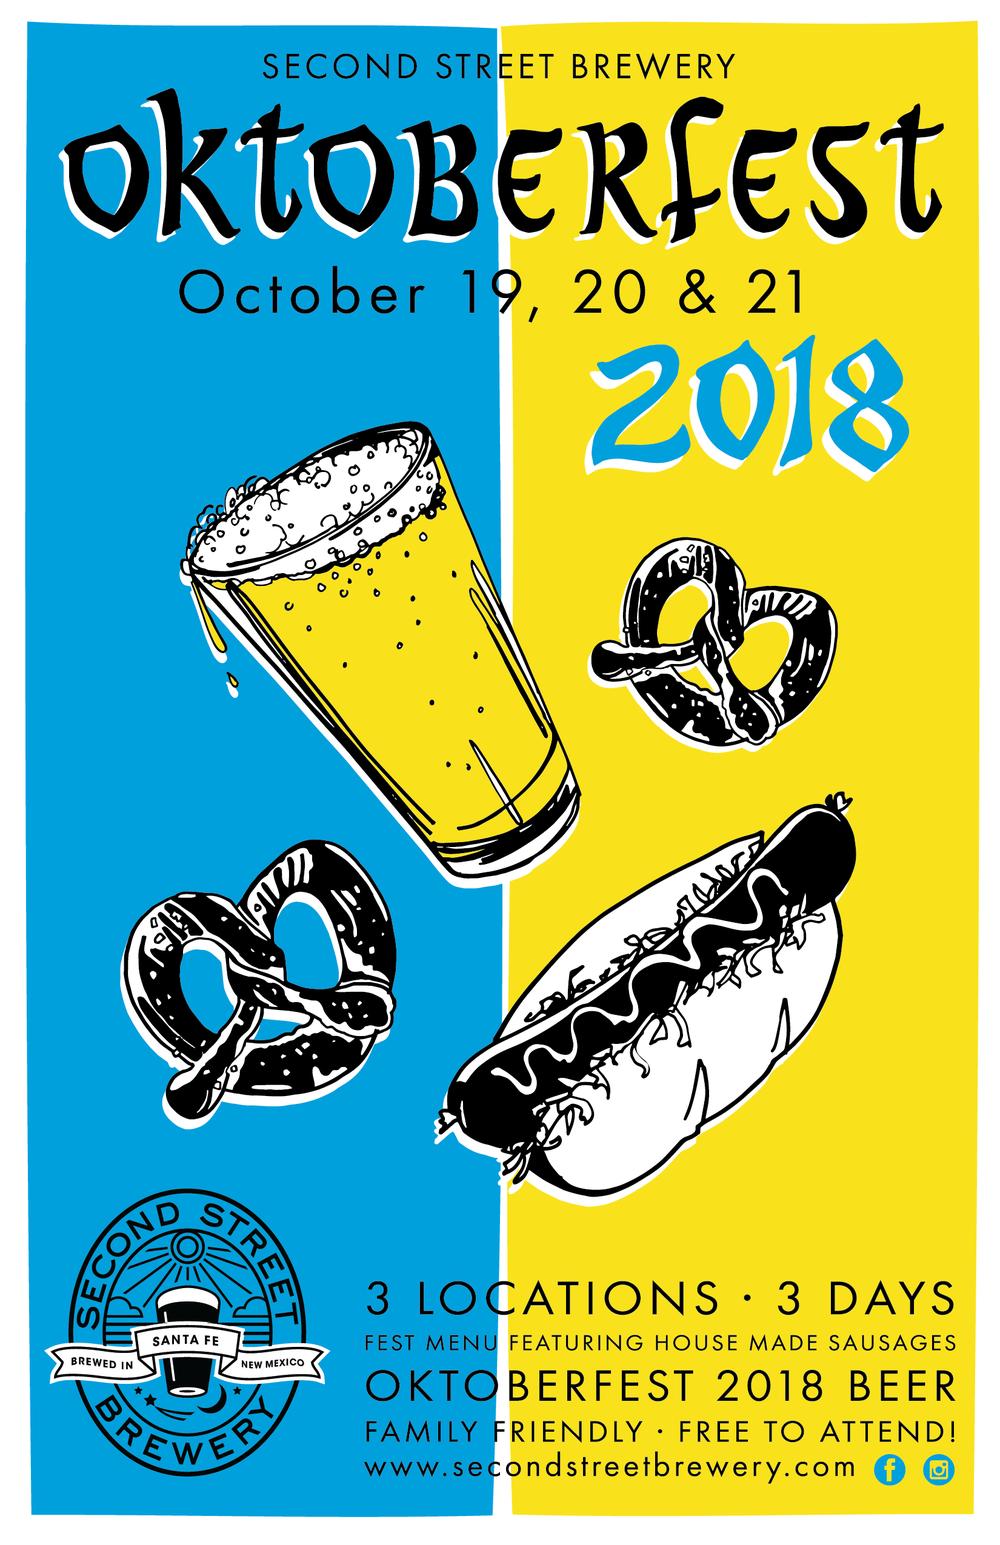 oktoberfest_2018_poster-01.png